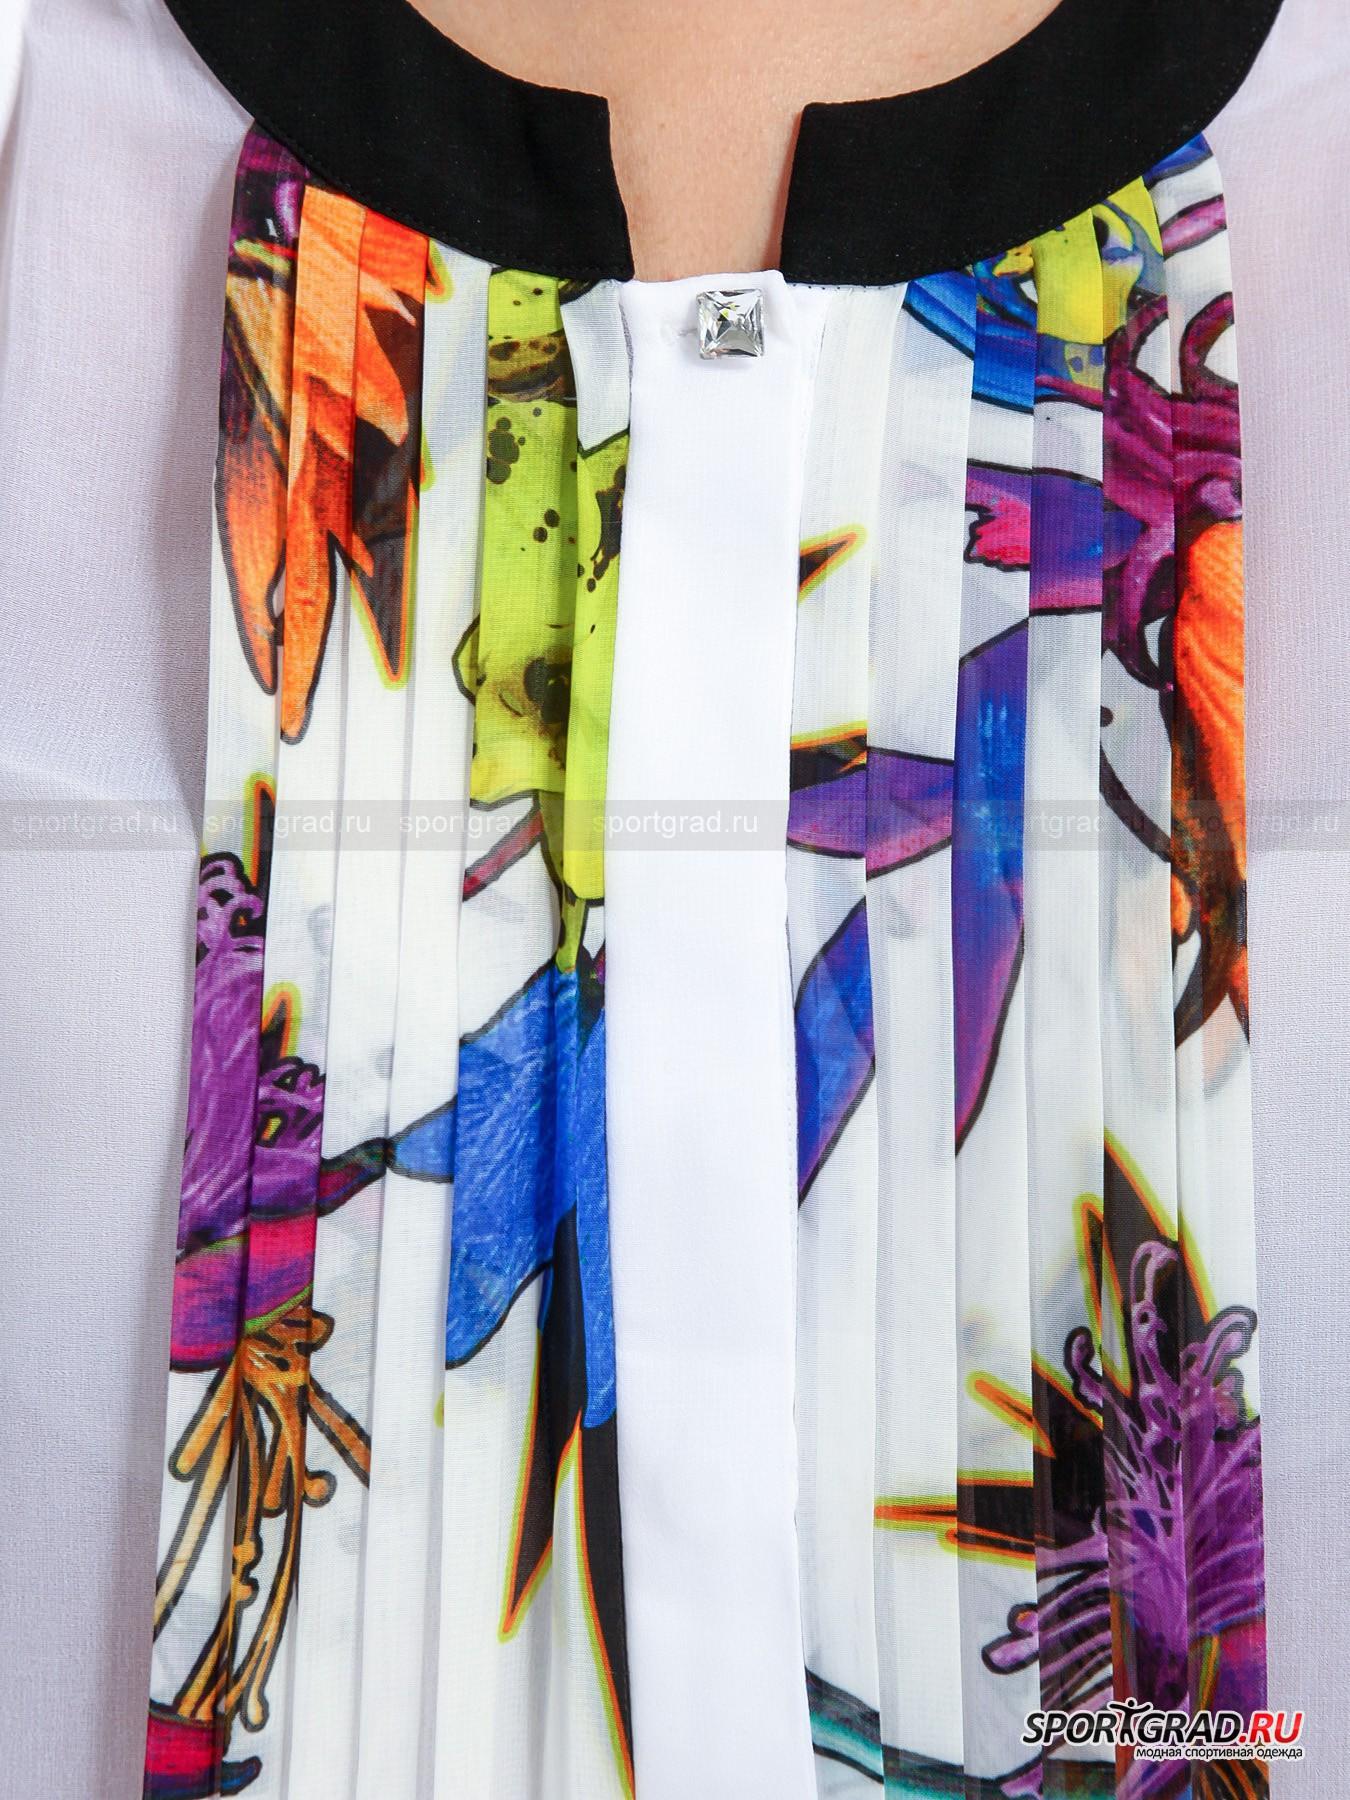 Блузка женская JUST CAVALLI без рукавов от Спортград